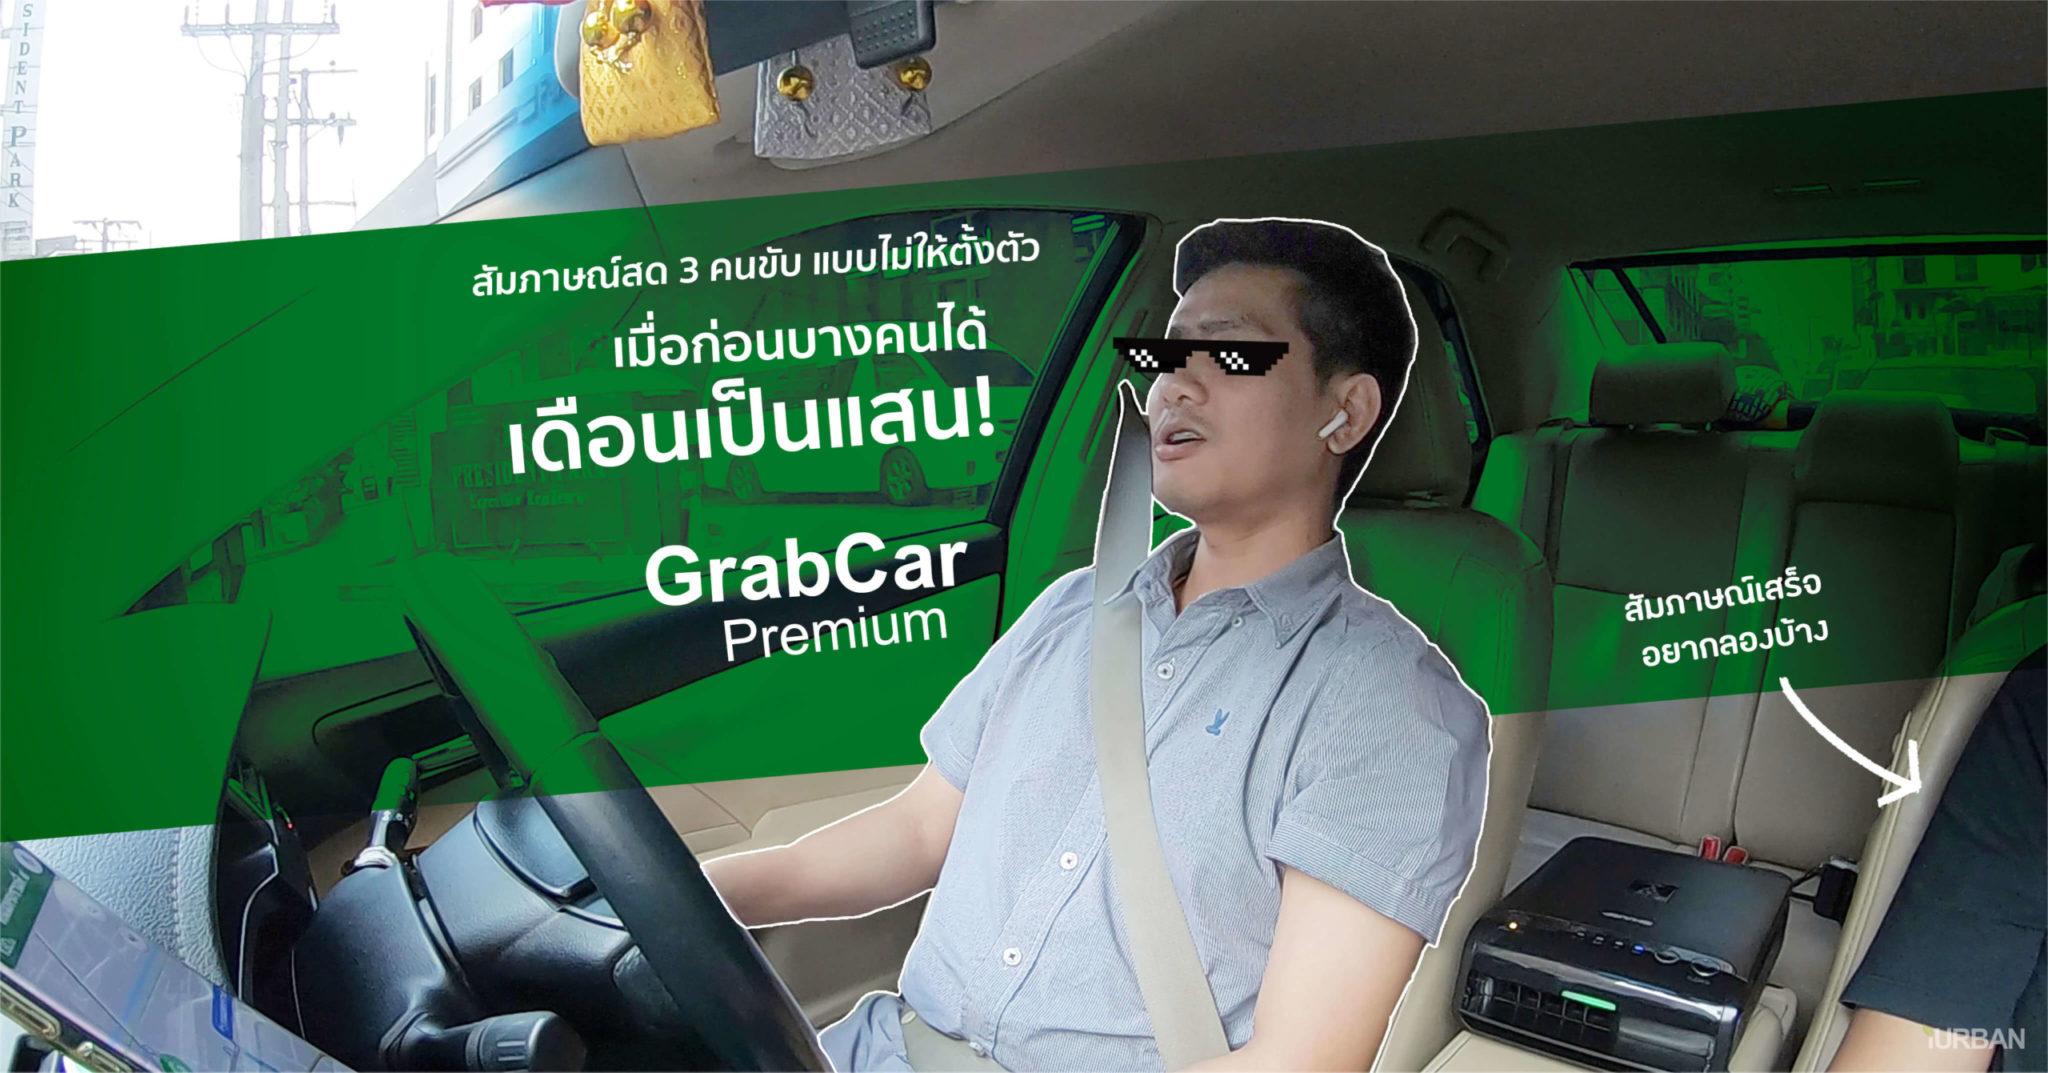 GrabCar Premium ทำเงินไม่ใช่เล่น! สัมภาษณ์สด 3 คนขับจริงแบบไม่ตั้งตัวบน Camry, Teana และ Starex! 13 - driver